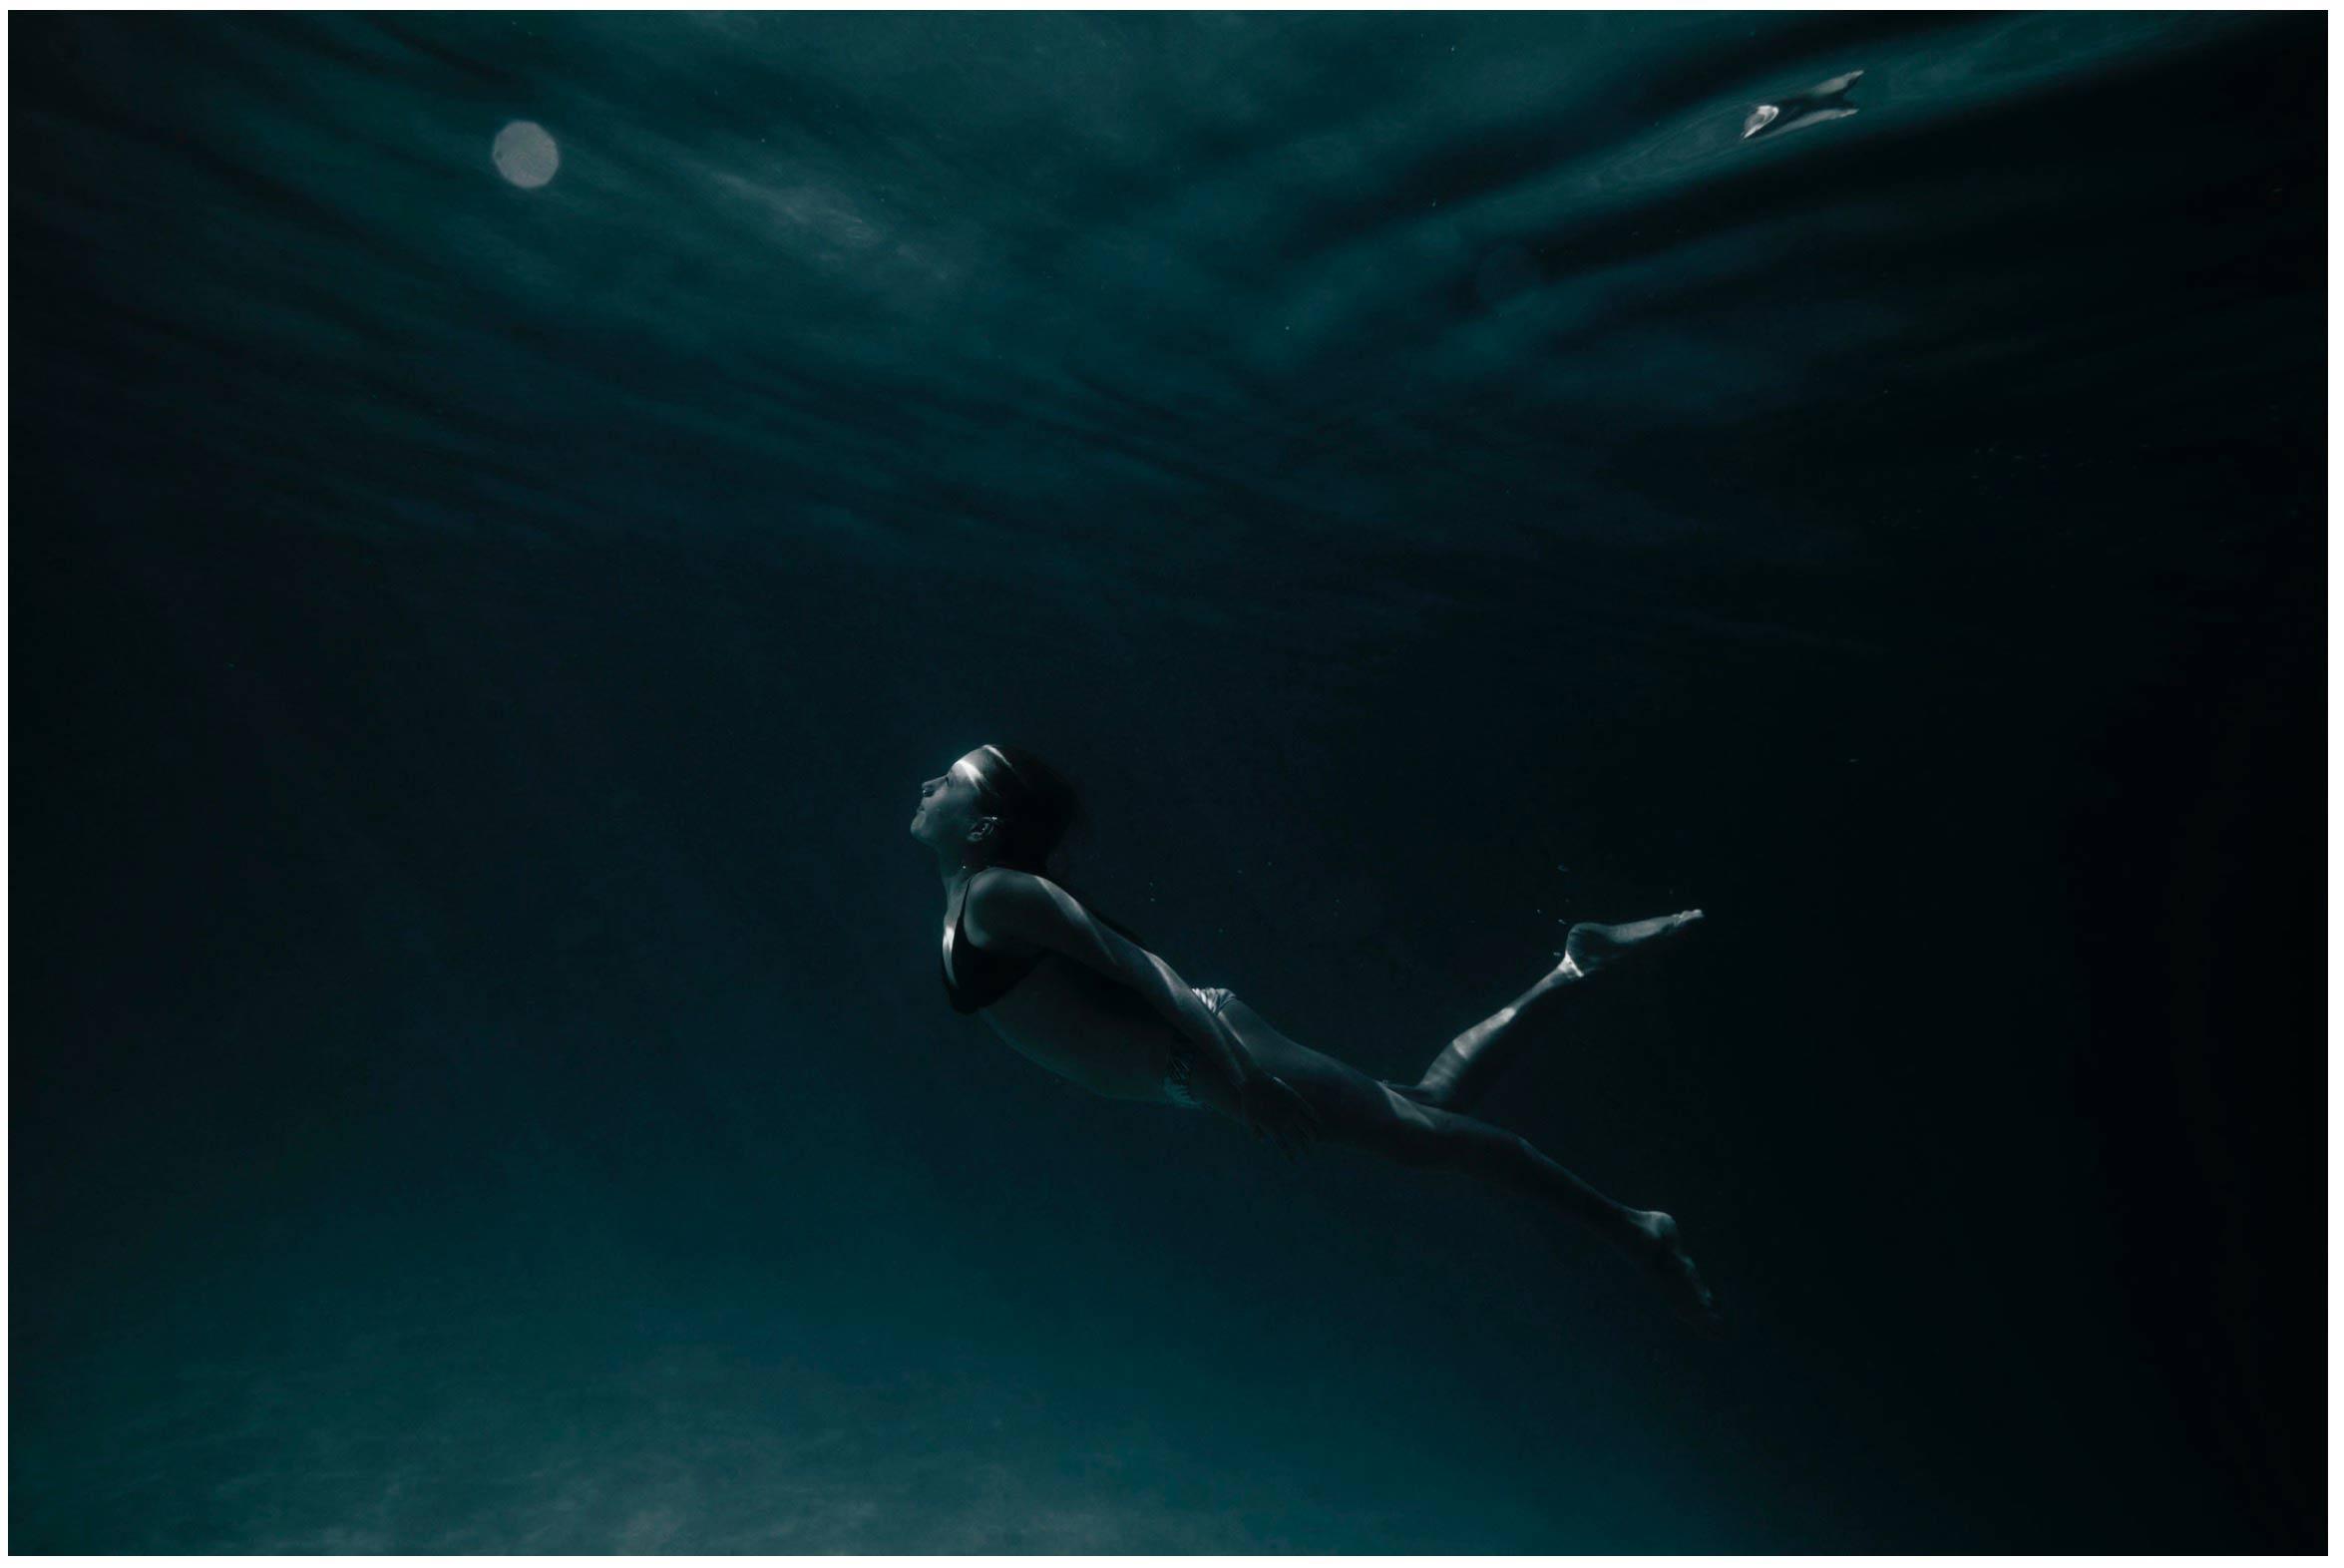 rodd-owen-ocean-surf-photography-artworks-for-sale-008.jpg